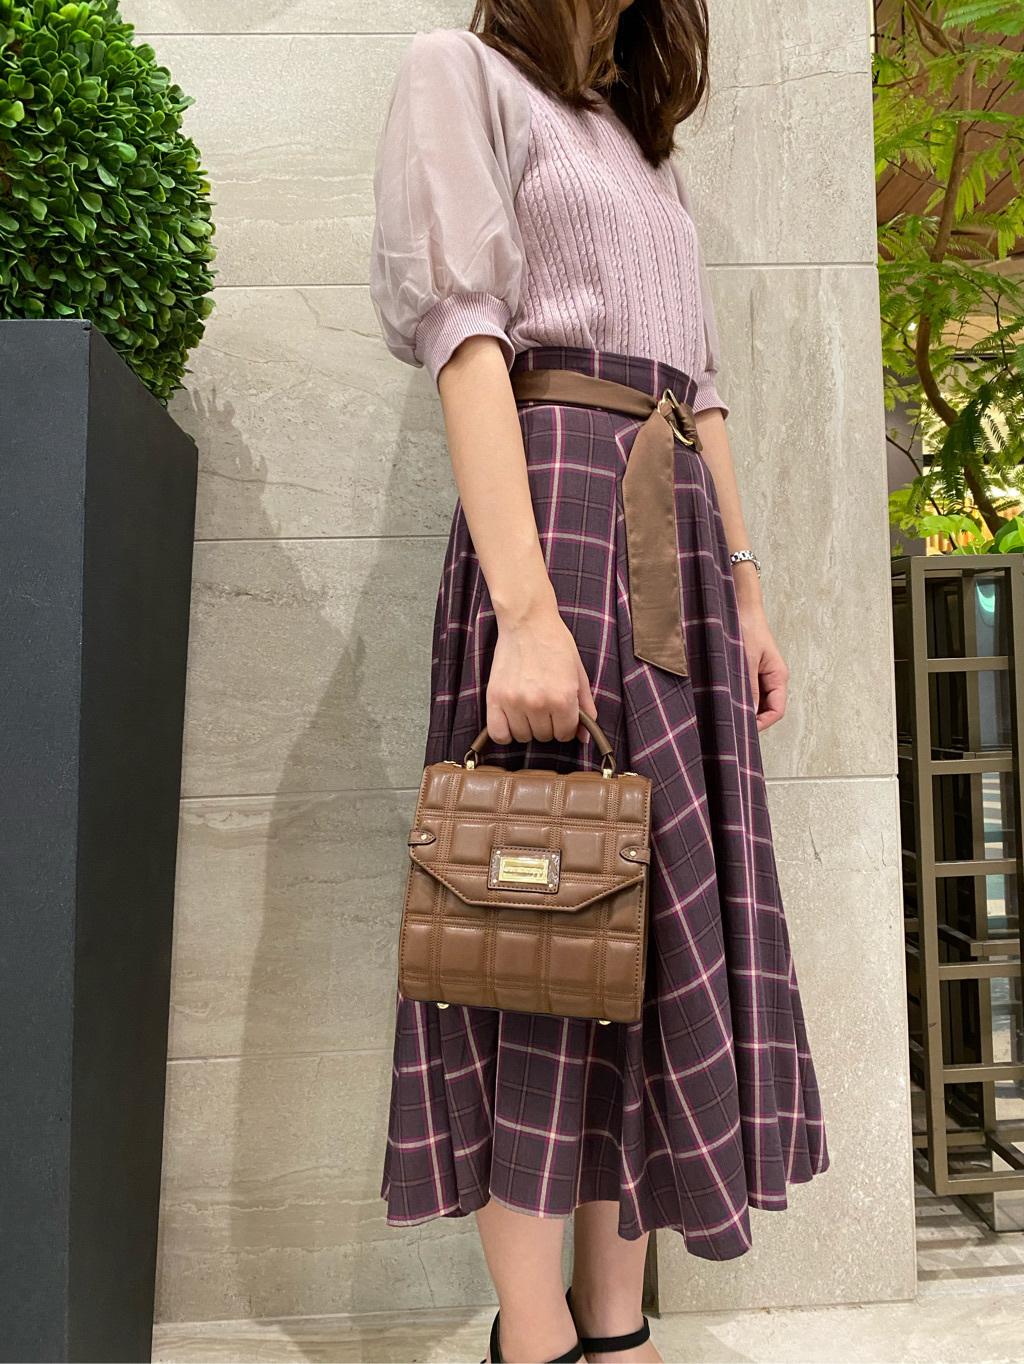 SAMANTHAVEGA Celebrity 福岡パルコ店 kaede